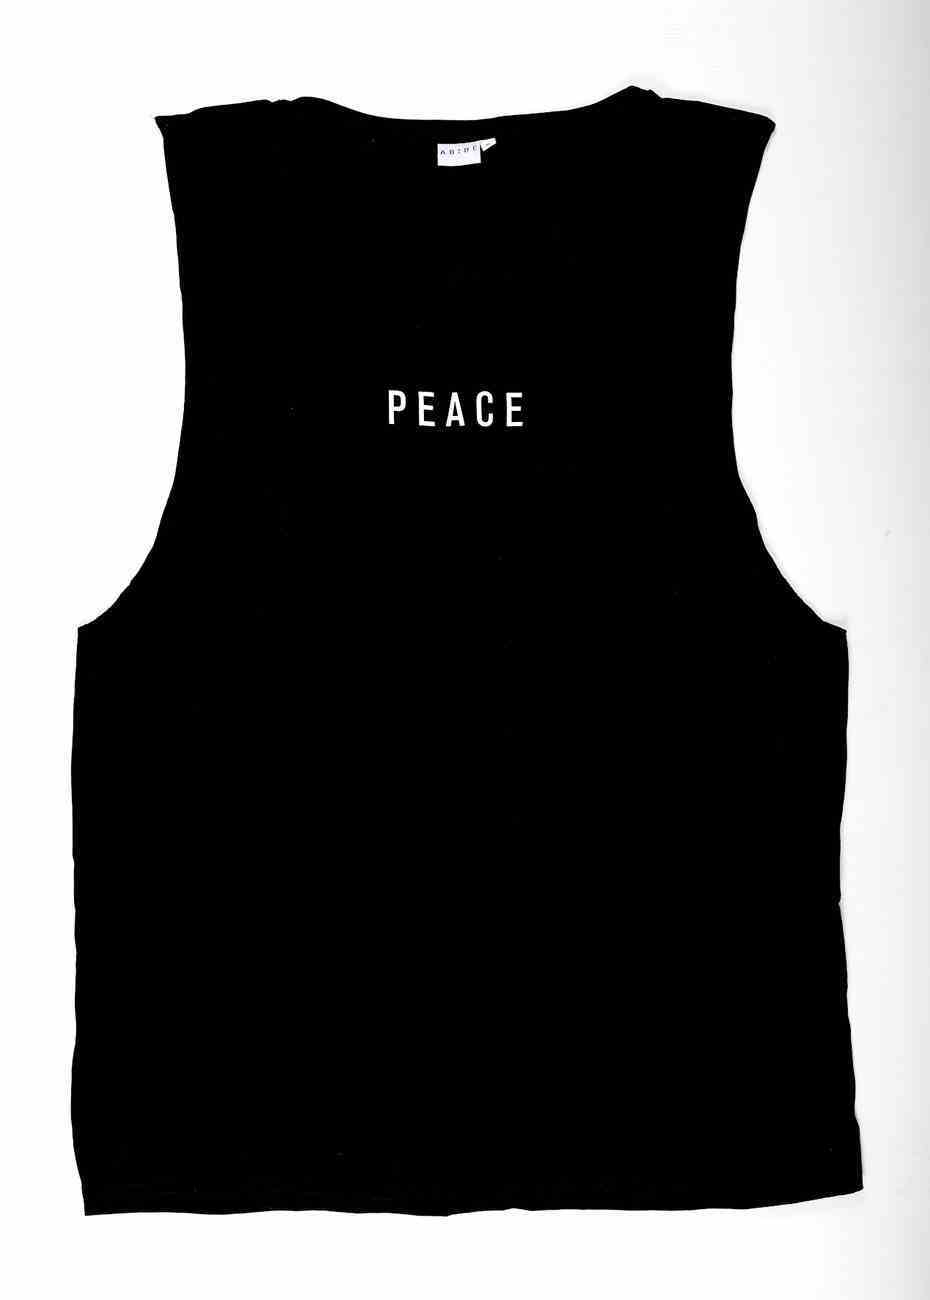 Mens Barnard Tank: Peace, Xlarge, Black With White Print (Abide T-shirt Apparel Series) Soft Goods